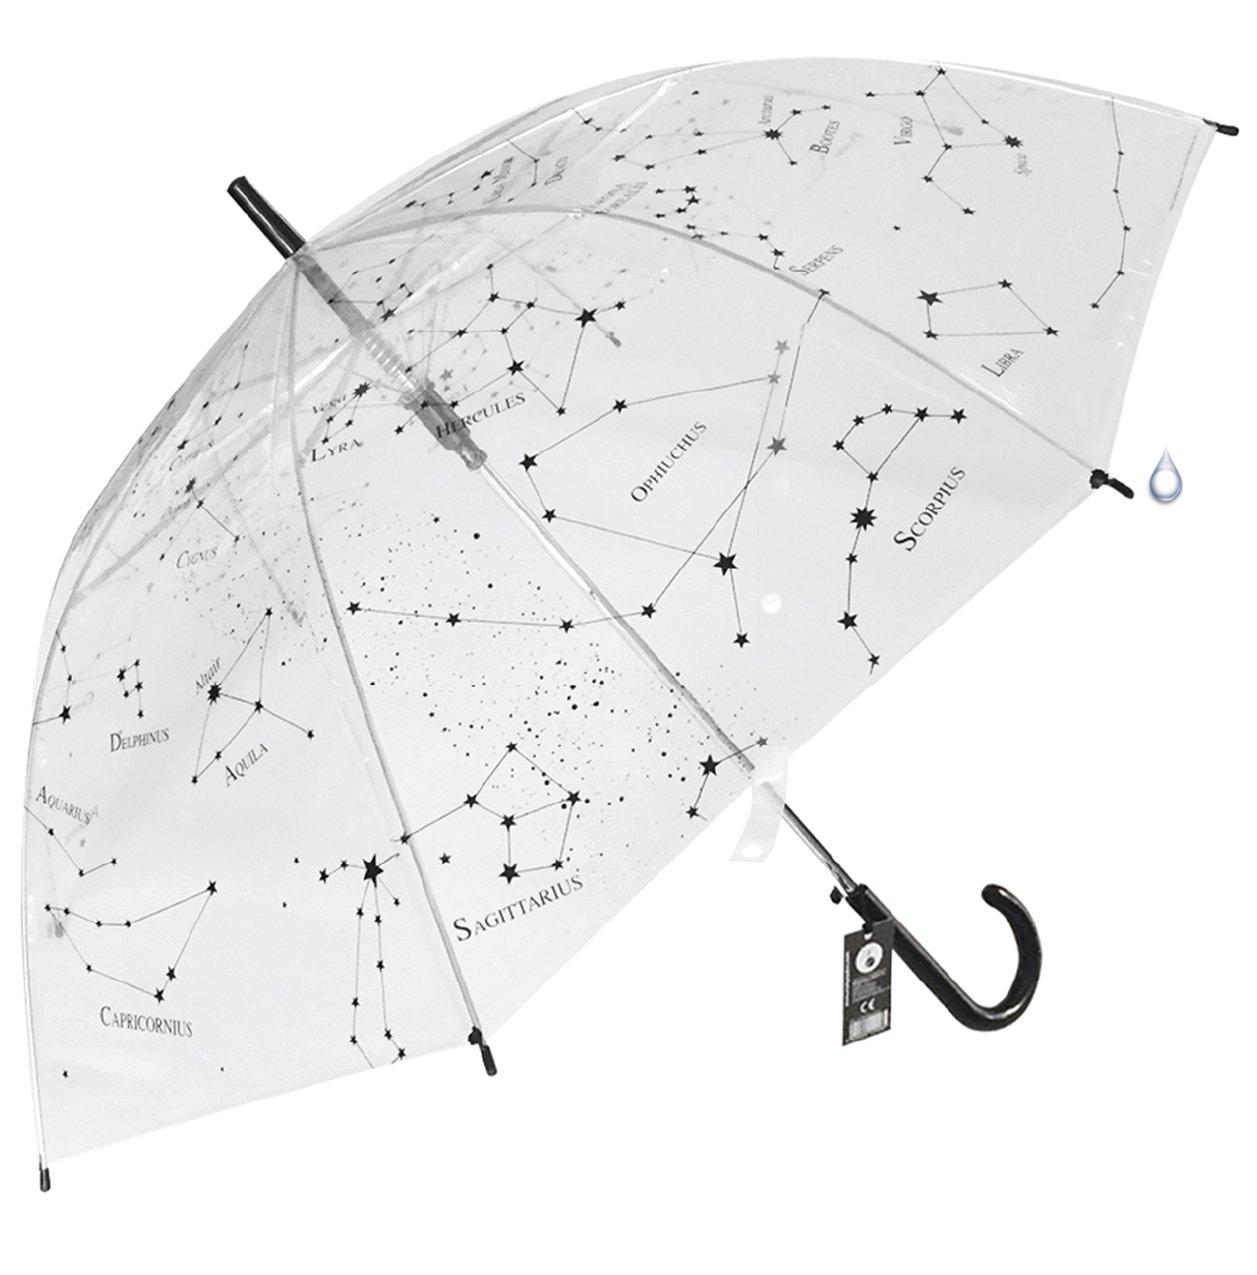 Paraguas transparente constelaciones